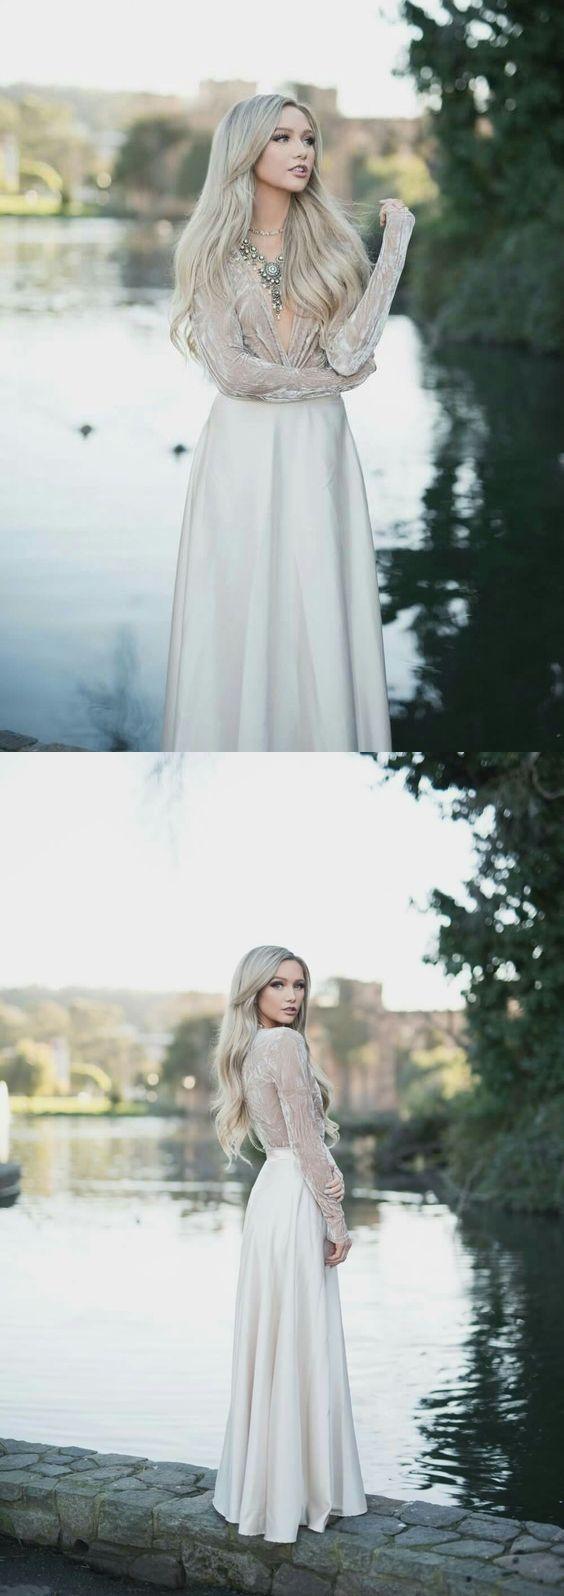 Long sleeve prom dresses deep v a line velvet top sexy prom dress